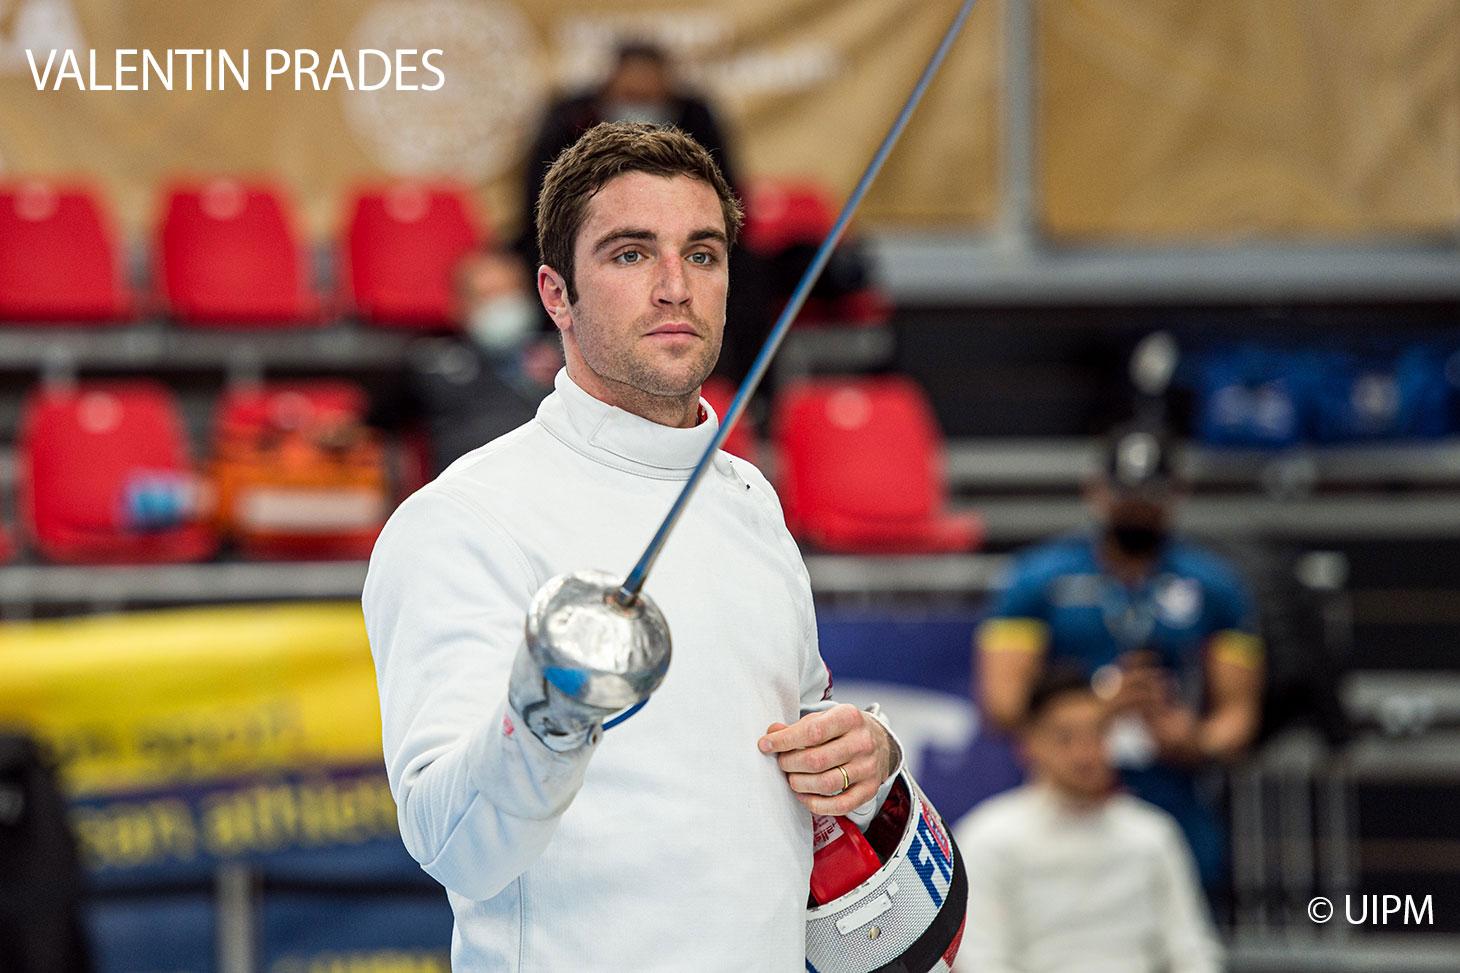 Valentin Prades, diplômé de l'UGA